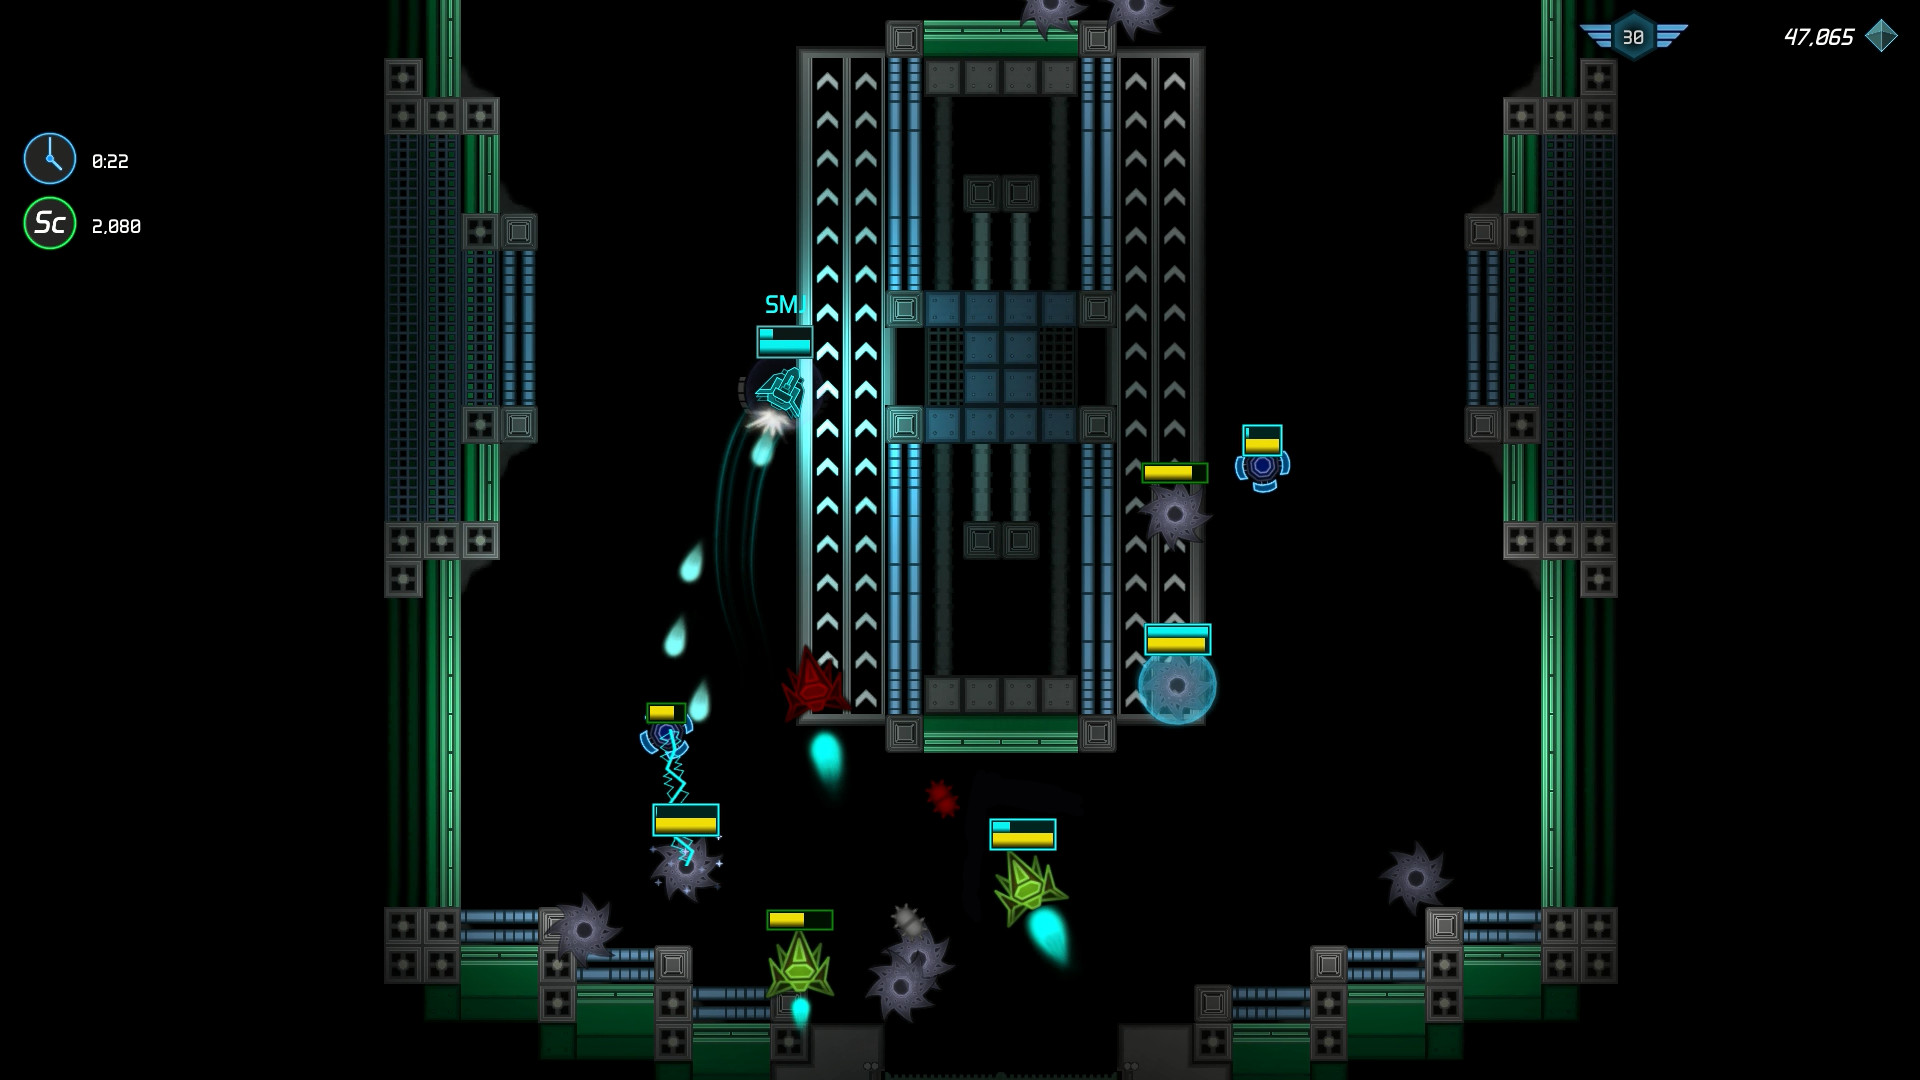 Aperion Cyberstorm screenshot